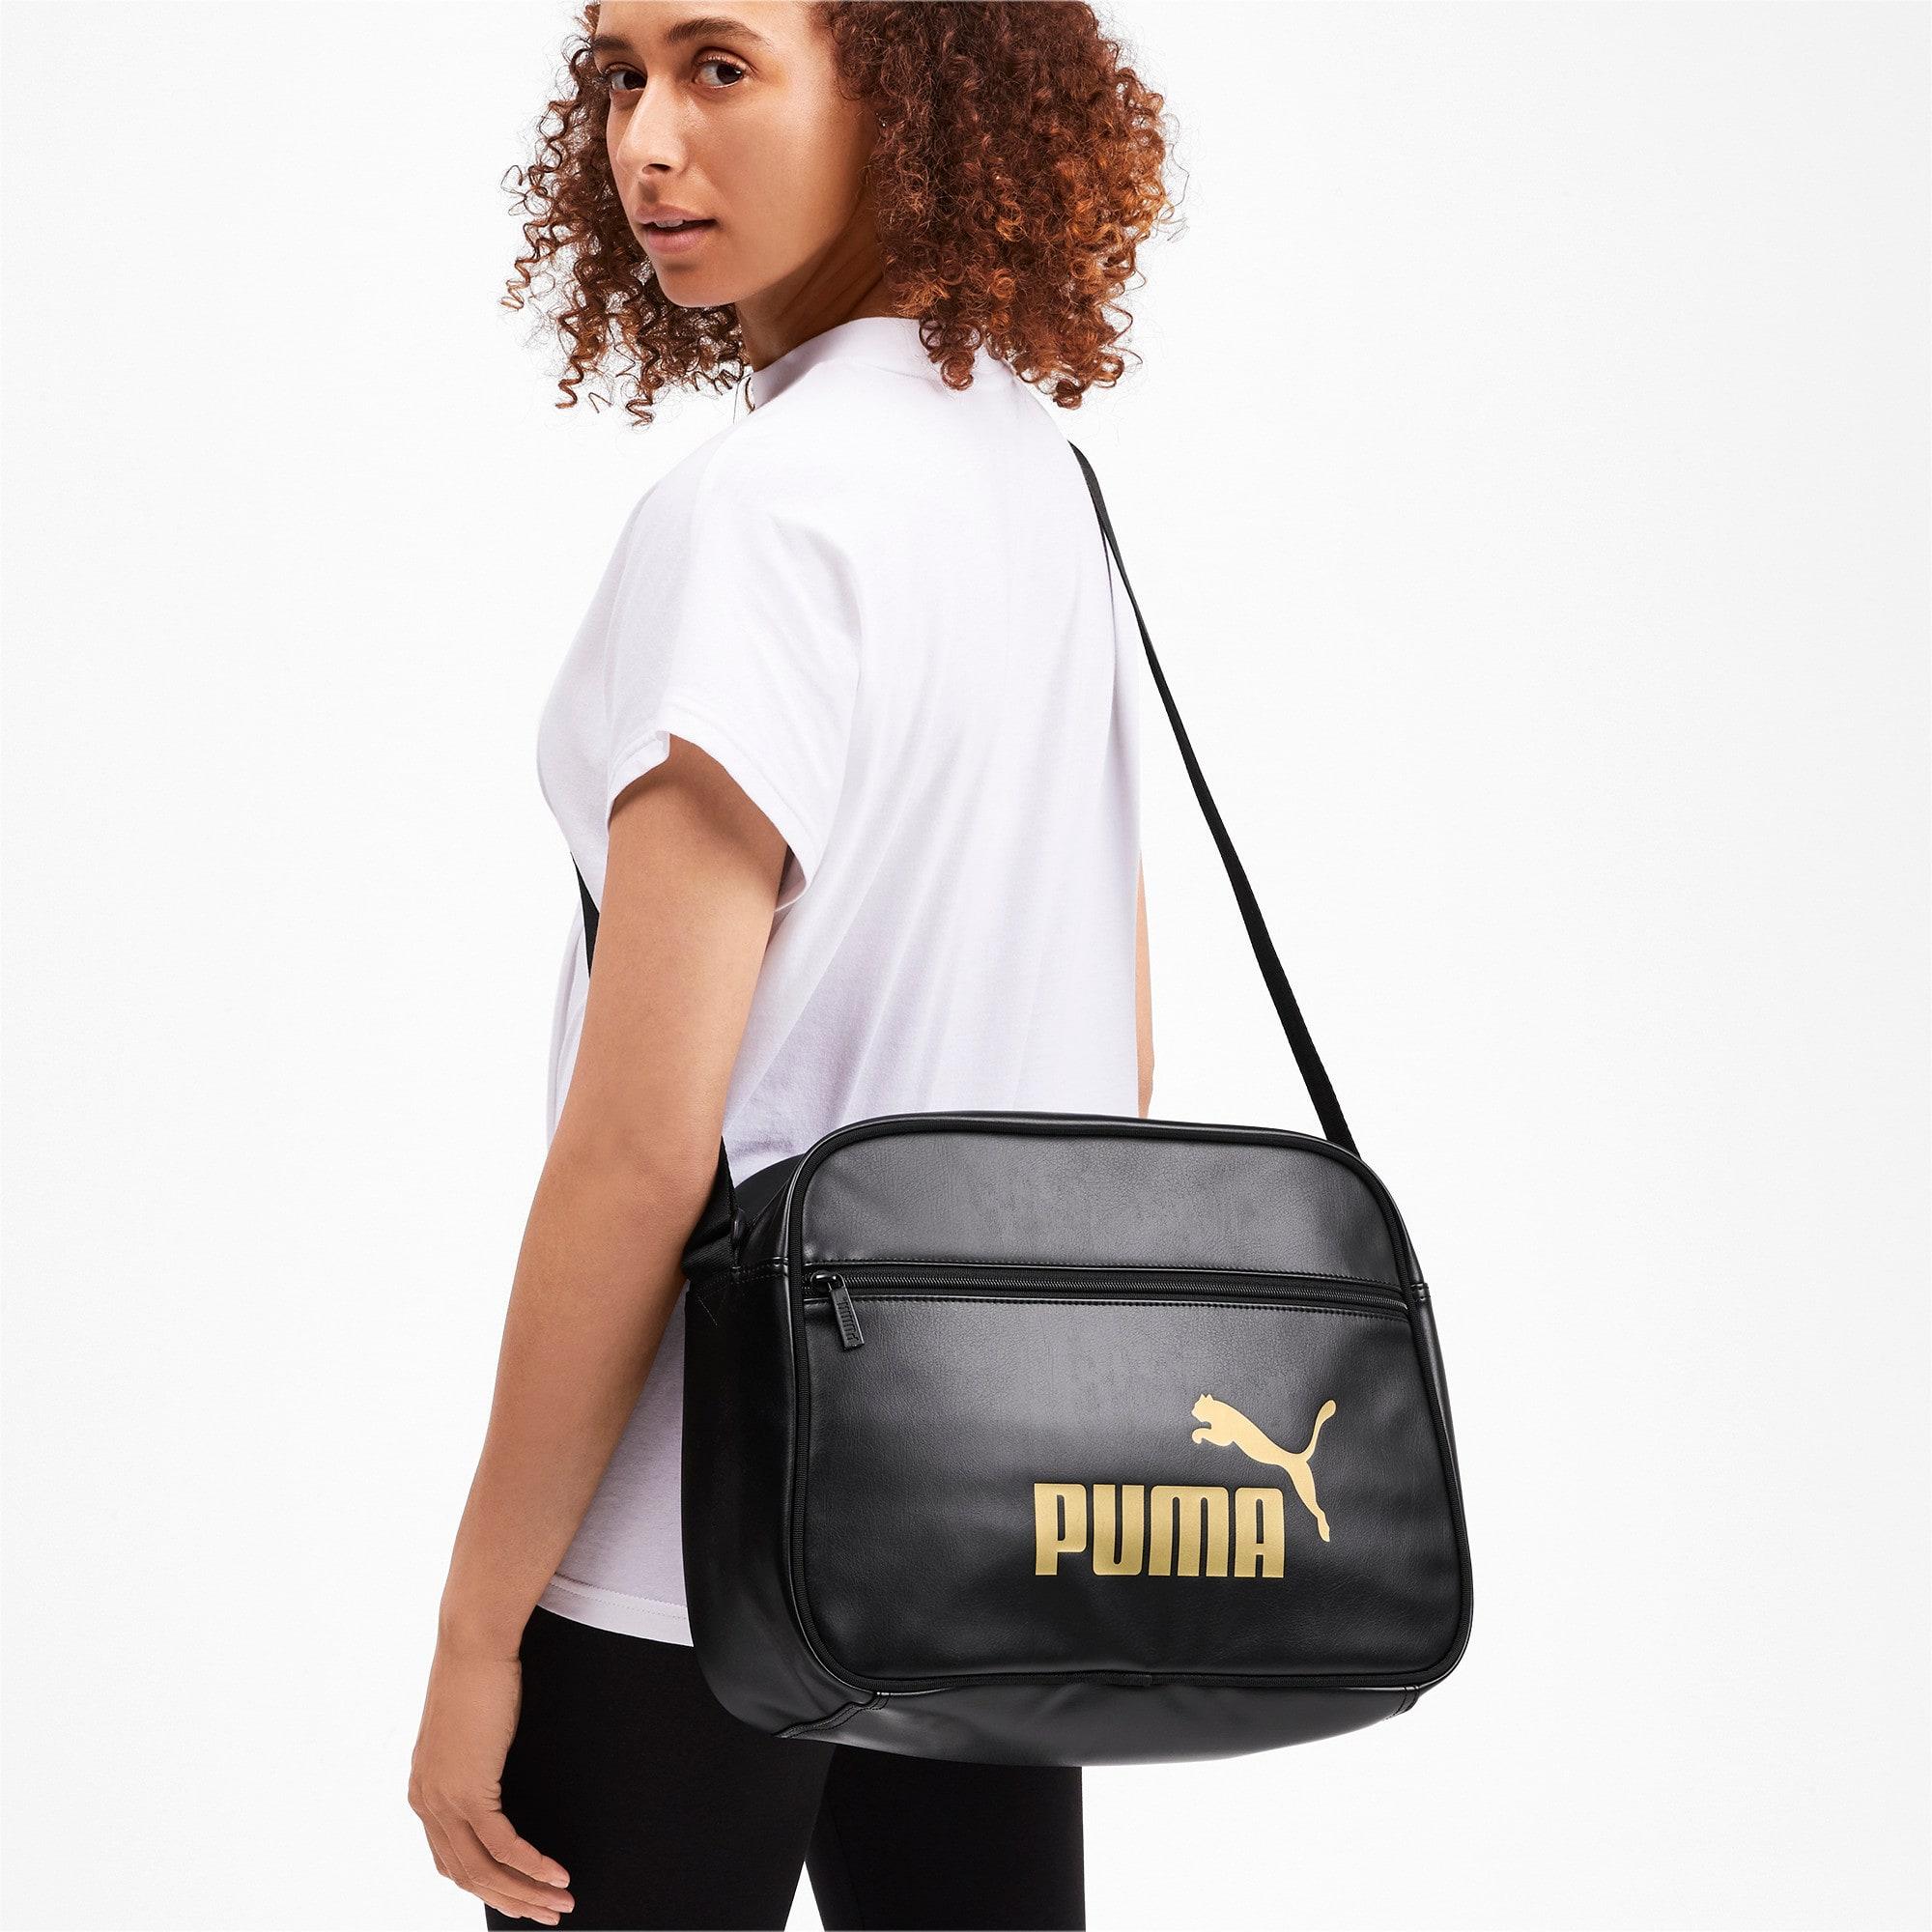 Thumbnail 3 of Core Up Reporter Bag, Puma Black-Gold, medium